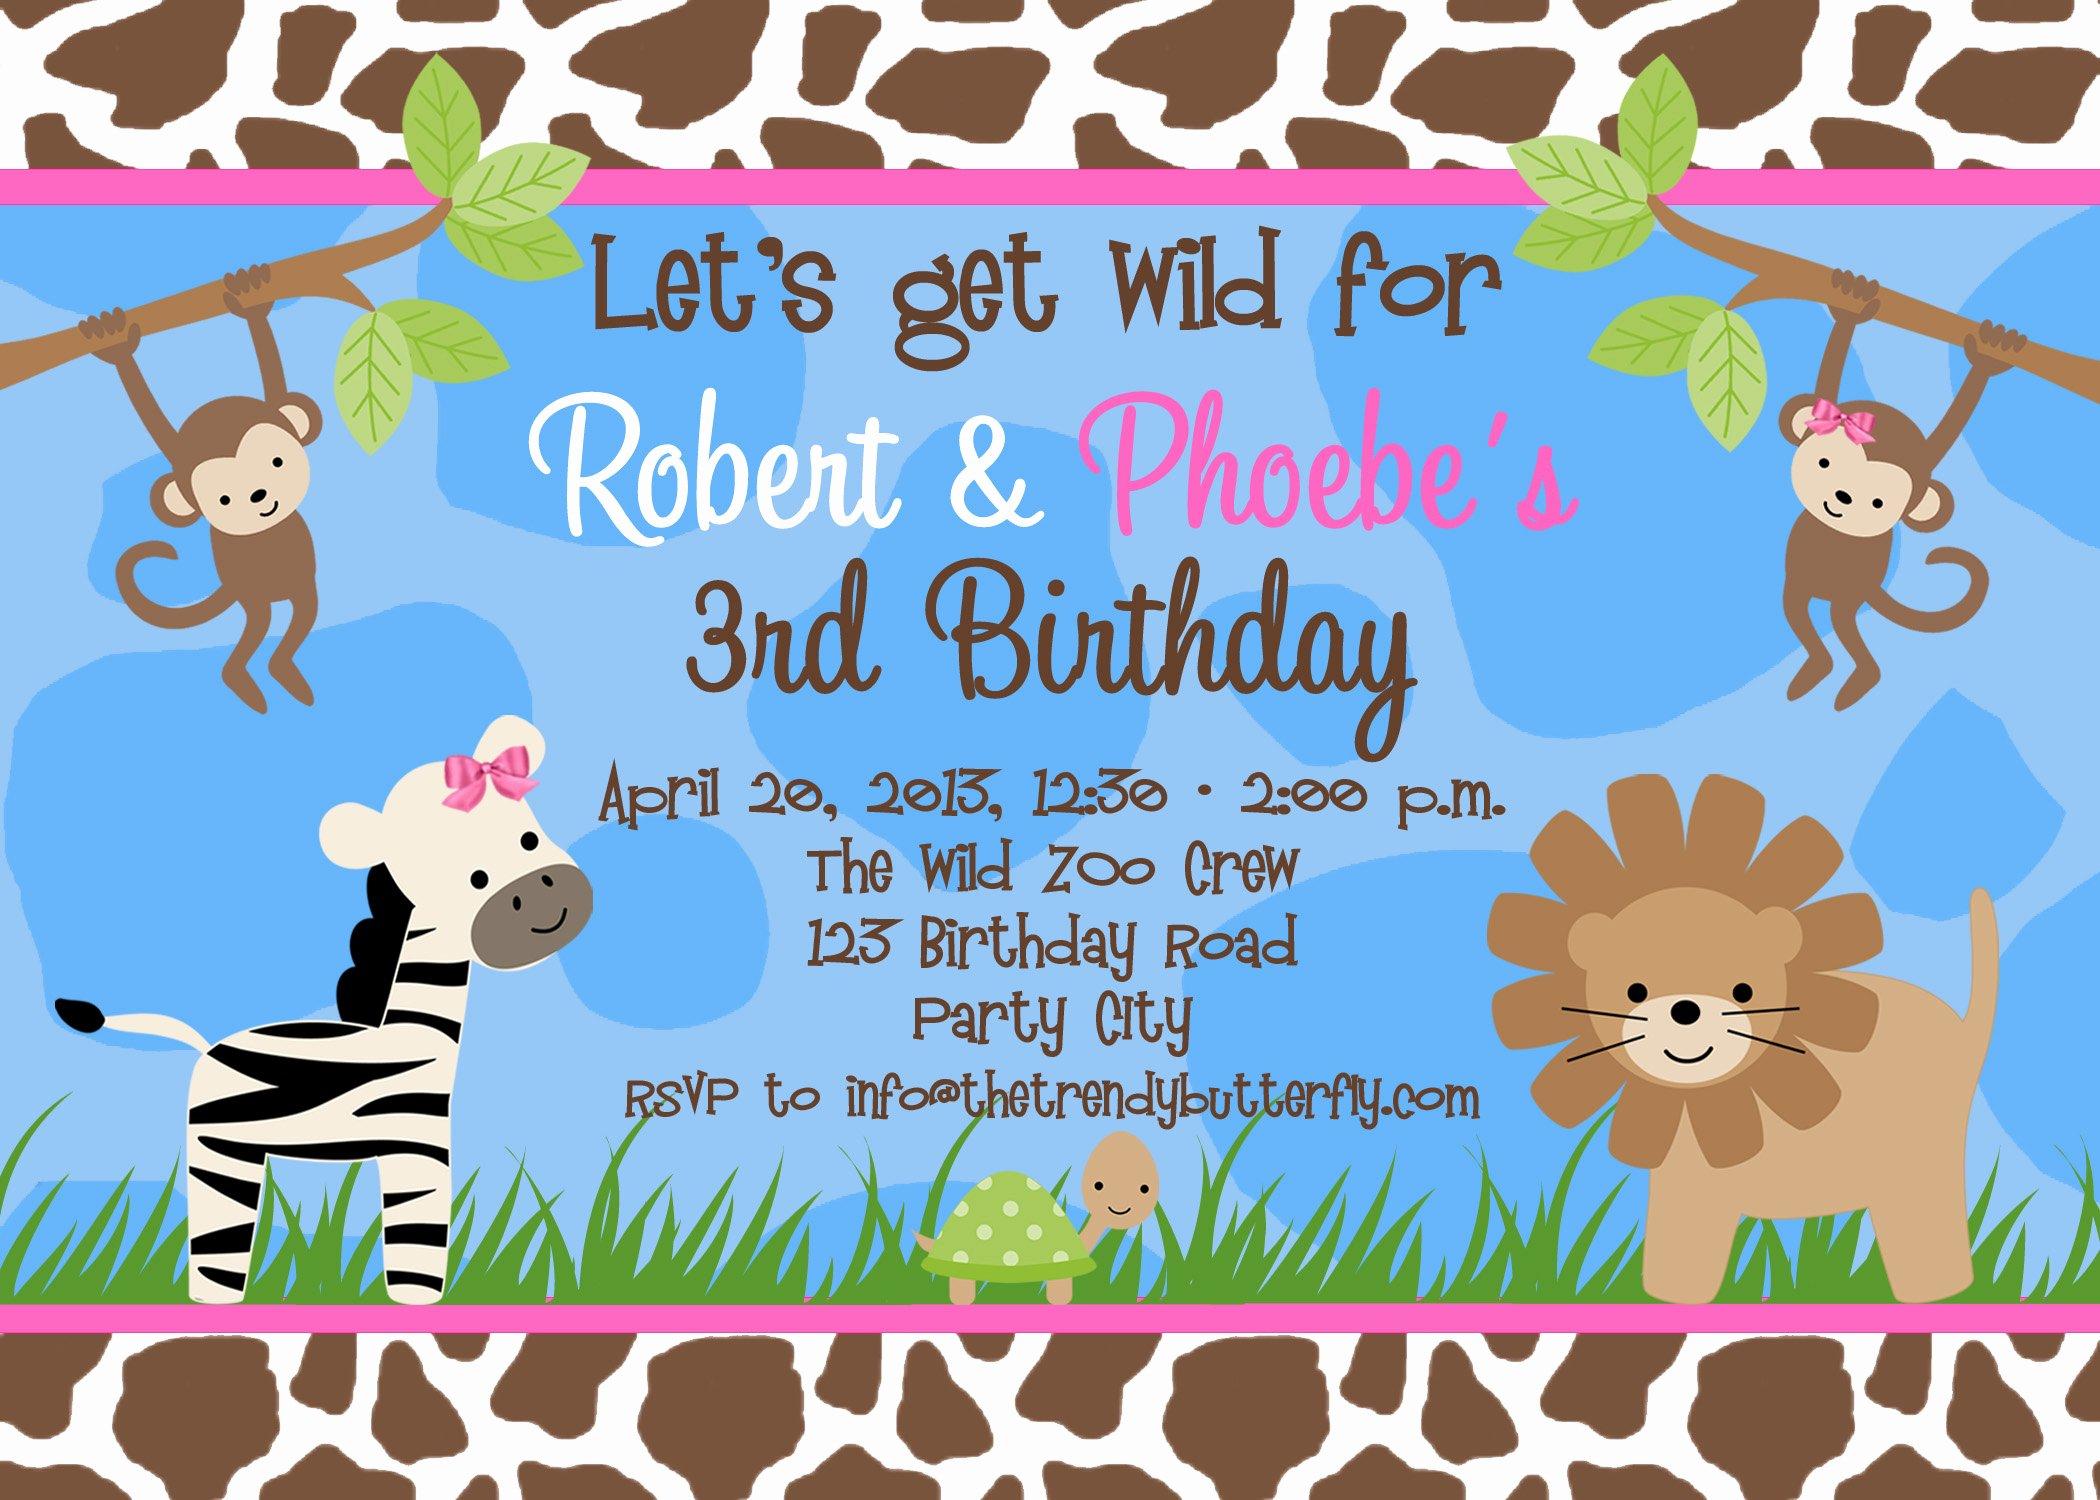 Free Printable Birthday Invitation Templates Inspirational Free Birthday Party Invitation Templates